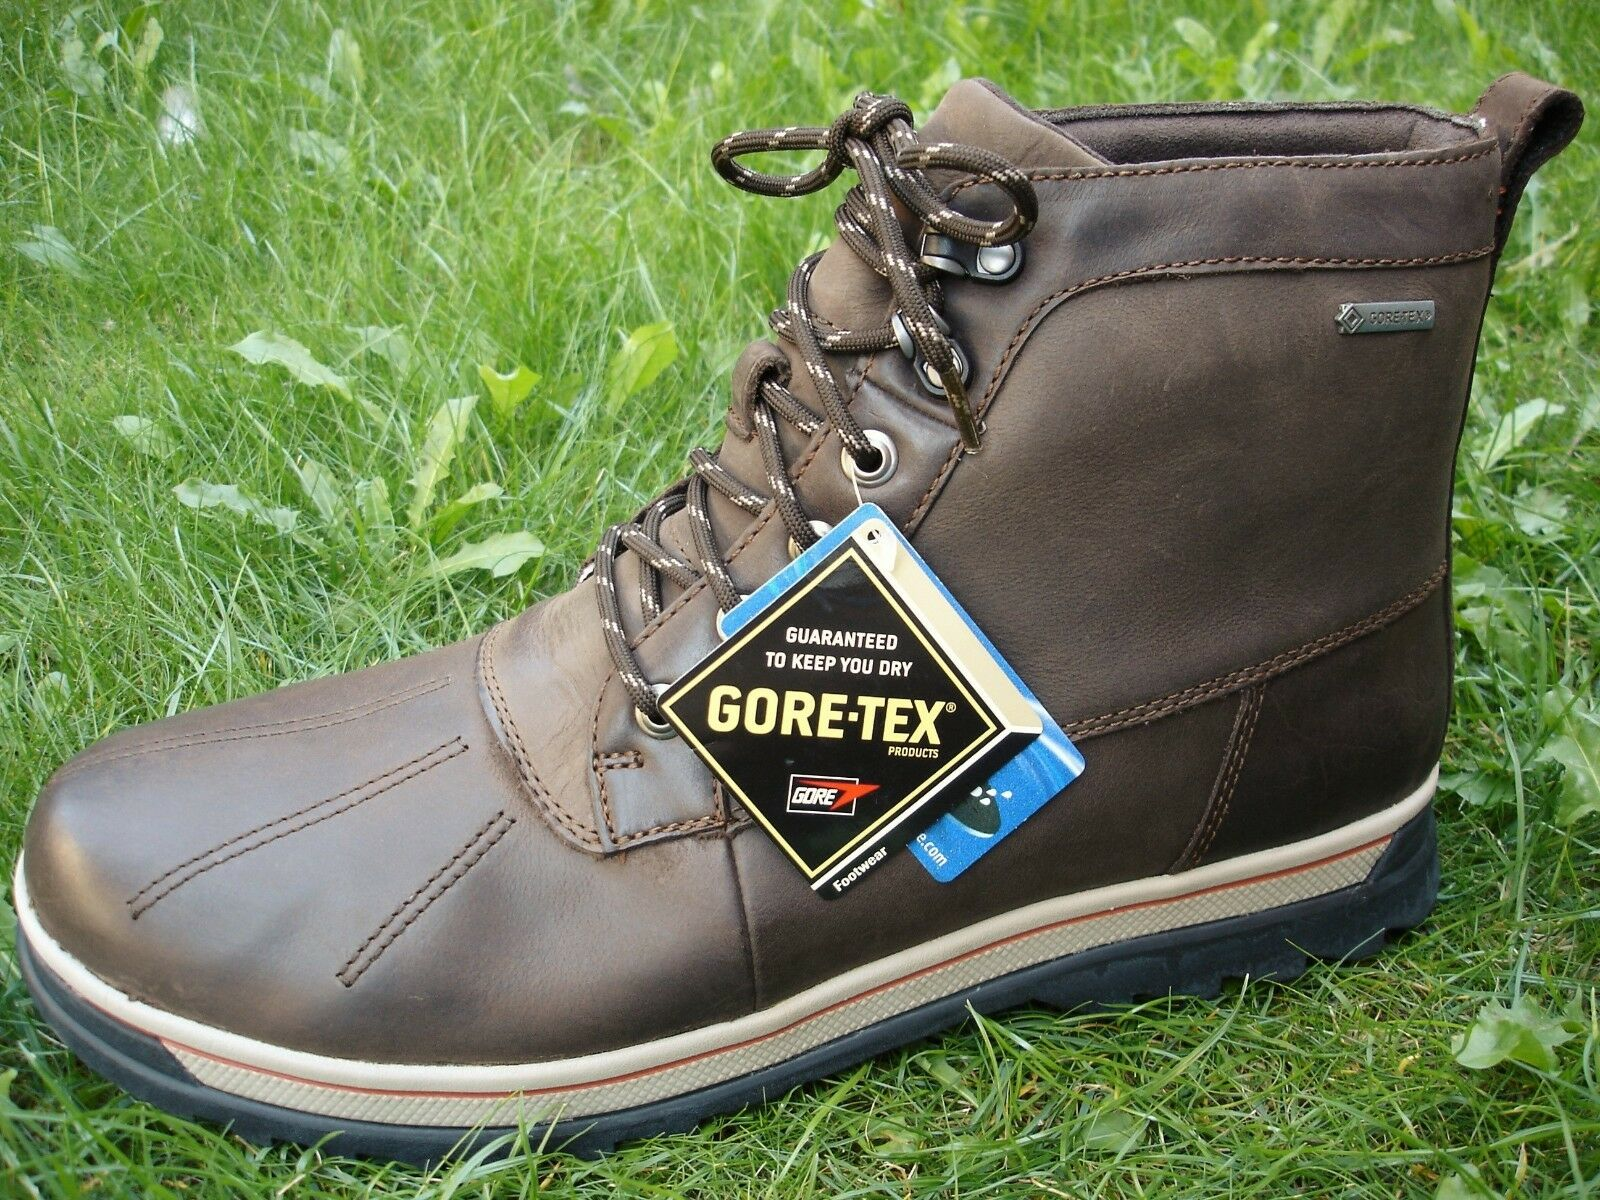 Clarks  WATERPROOF Ripway Trail BROWN LEATHER Boots Men WIDE-FIT UK-13 H  48 W